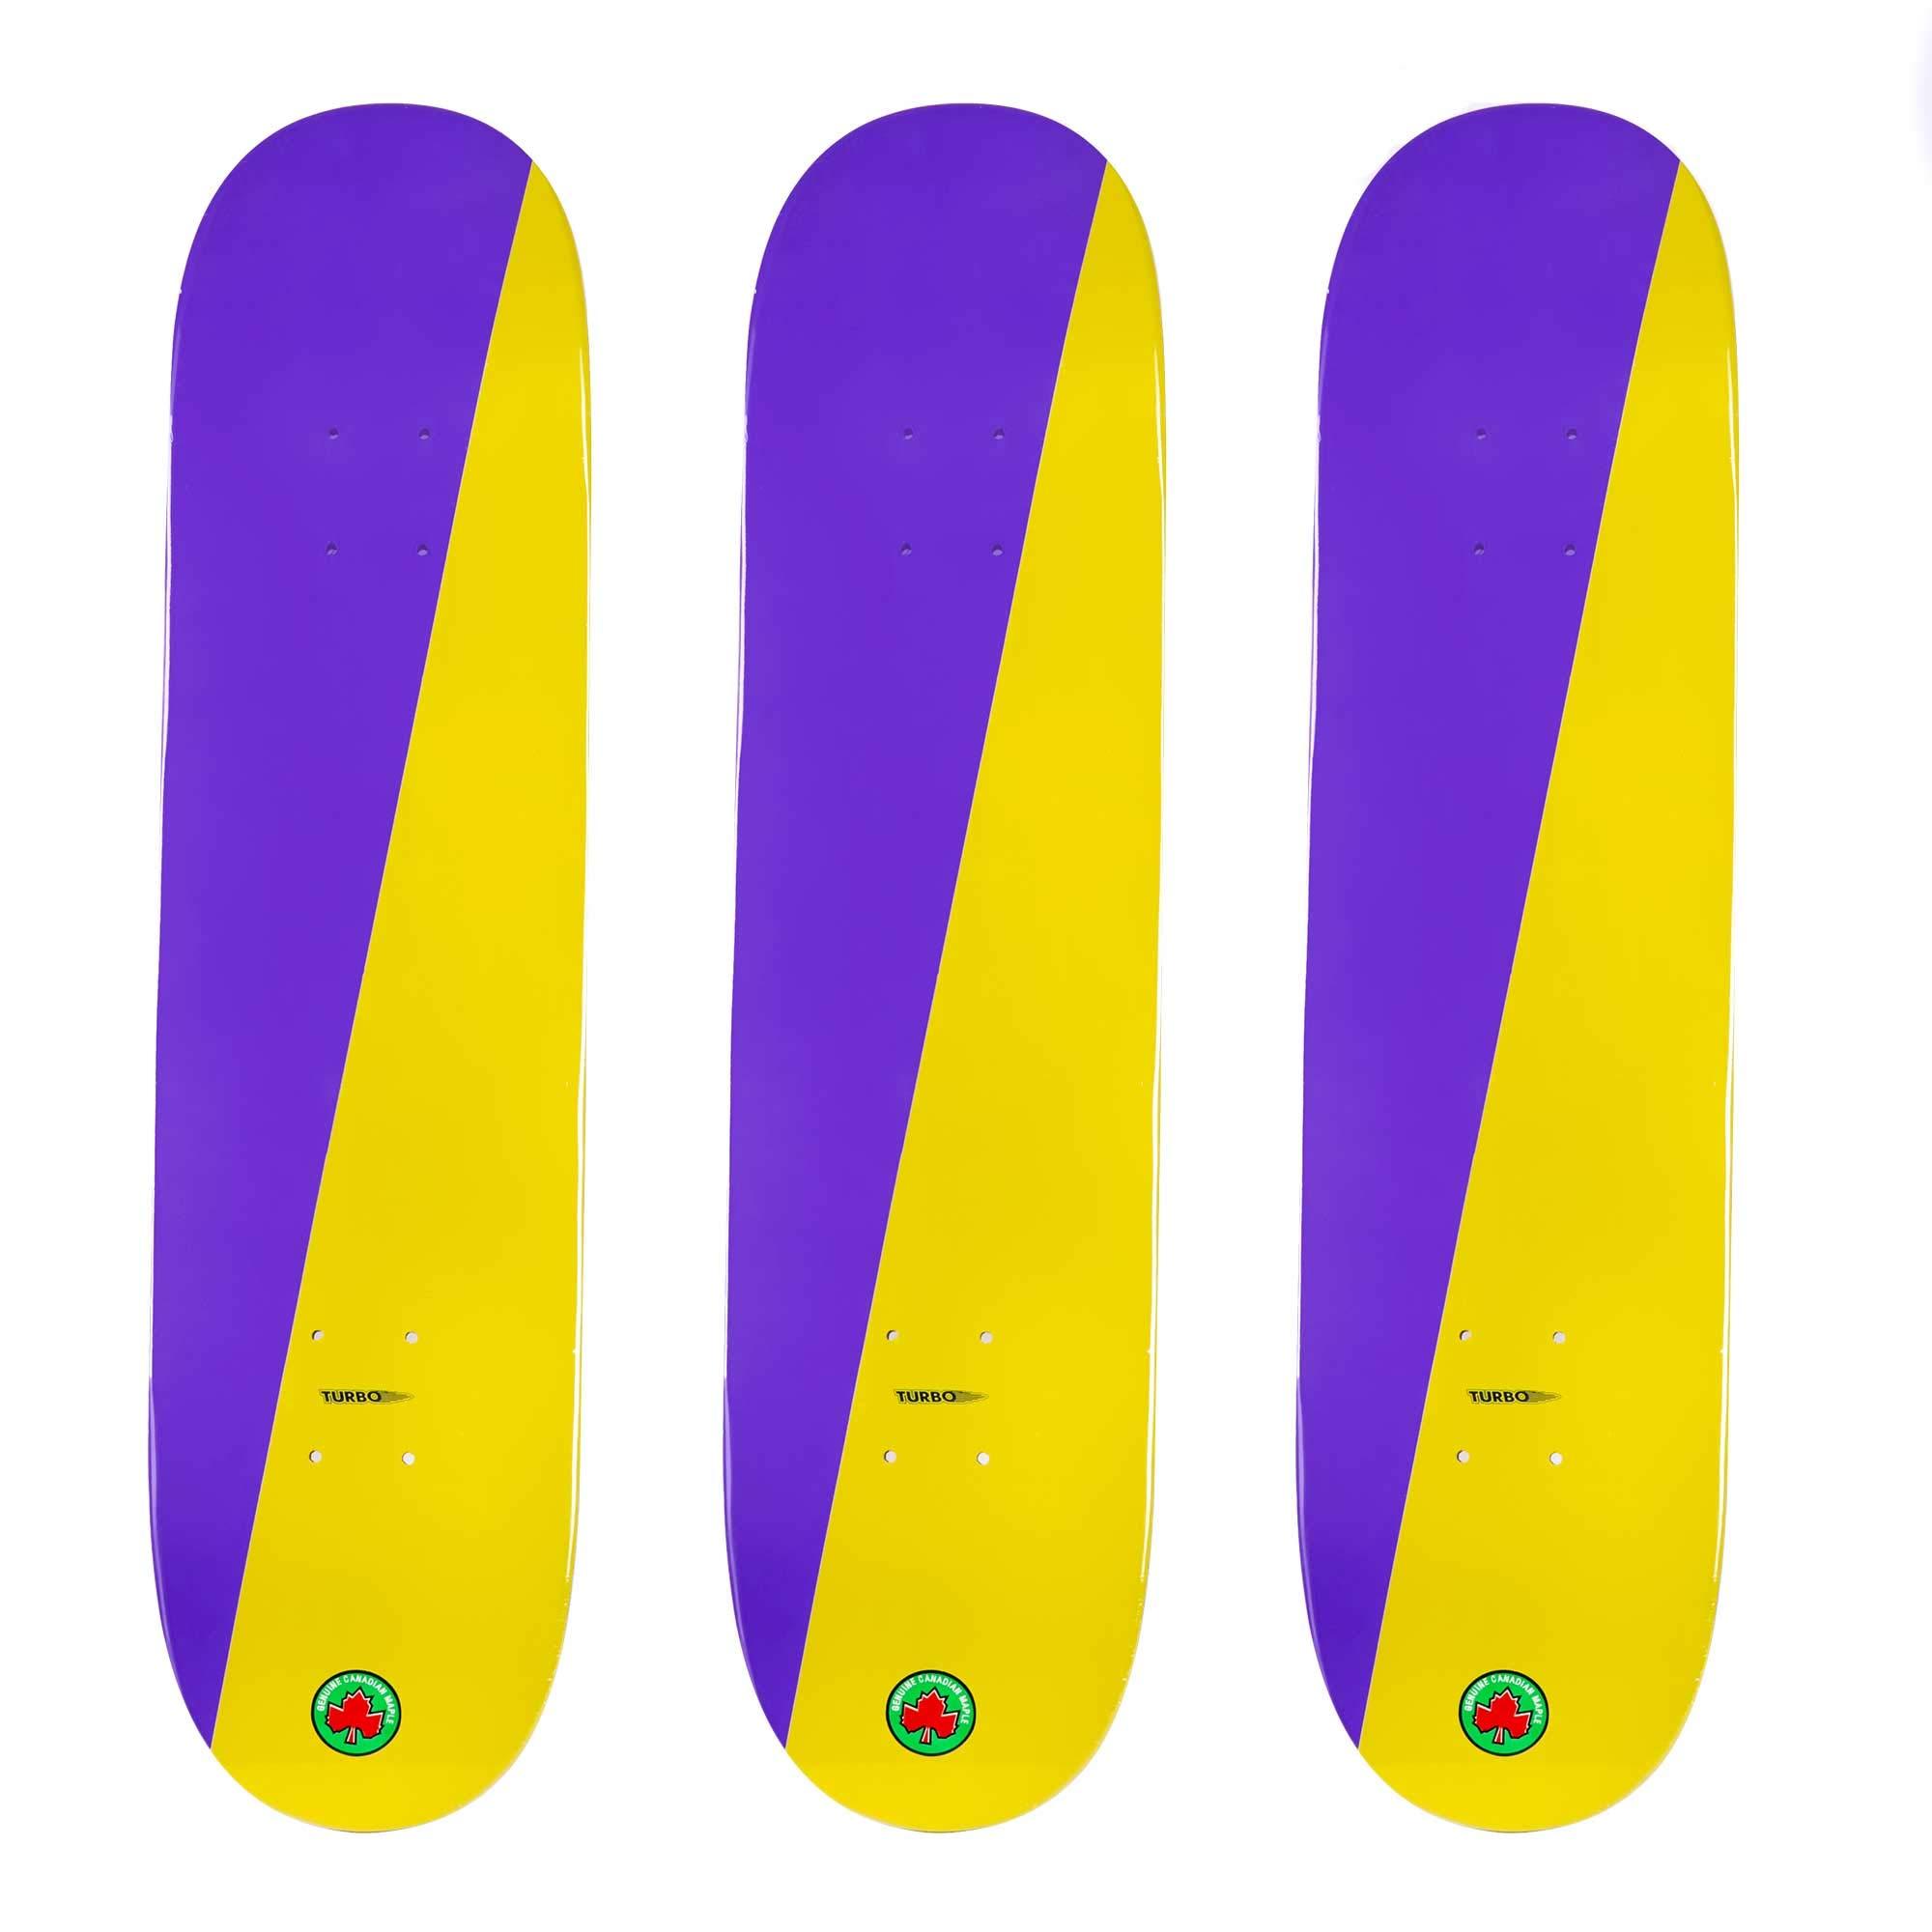 Cal 7 Blank Maple Skateboard Decks (Purple and Yellow, 7.5 inch)